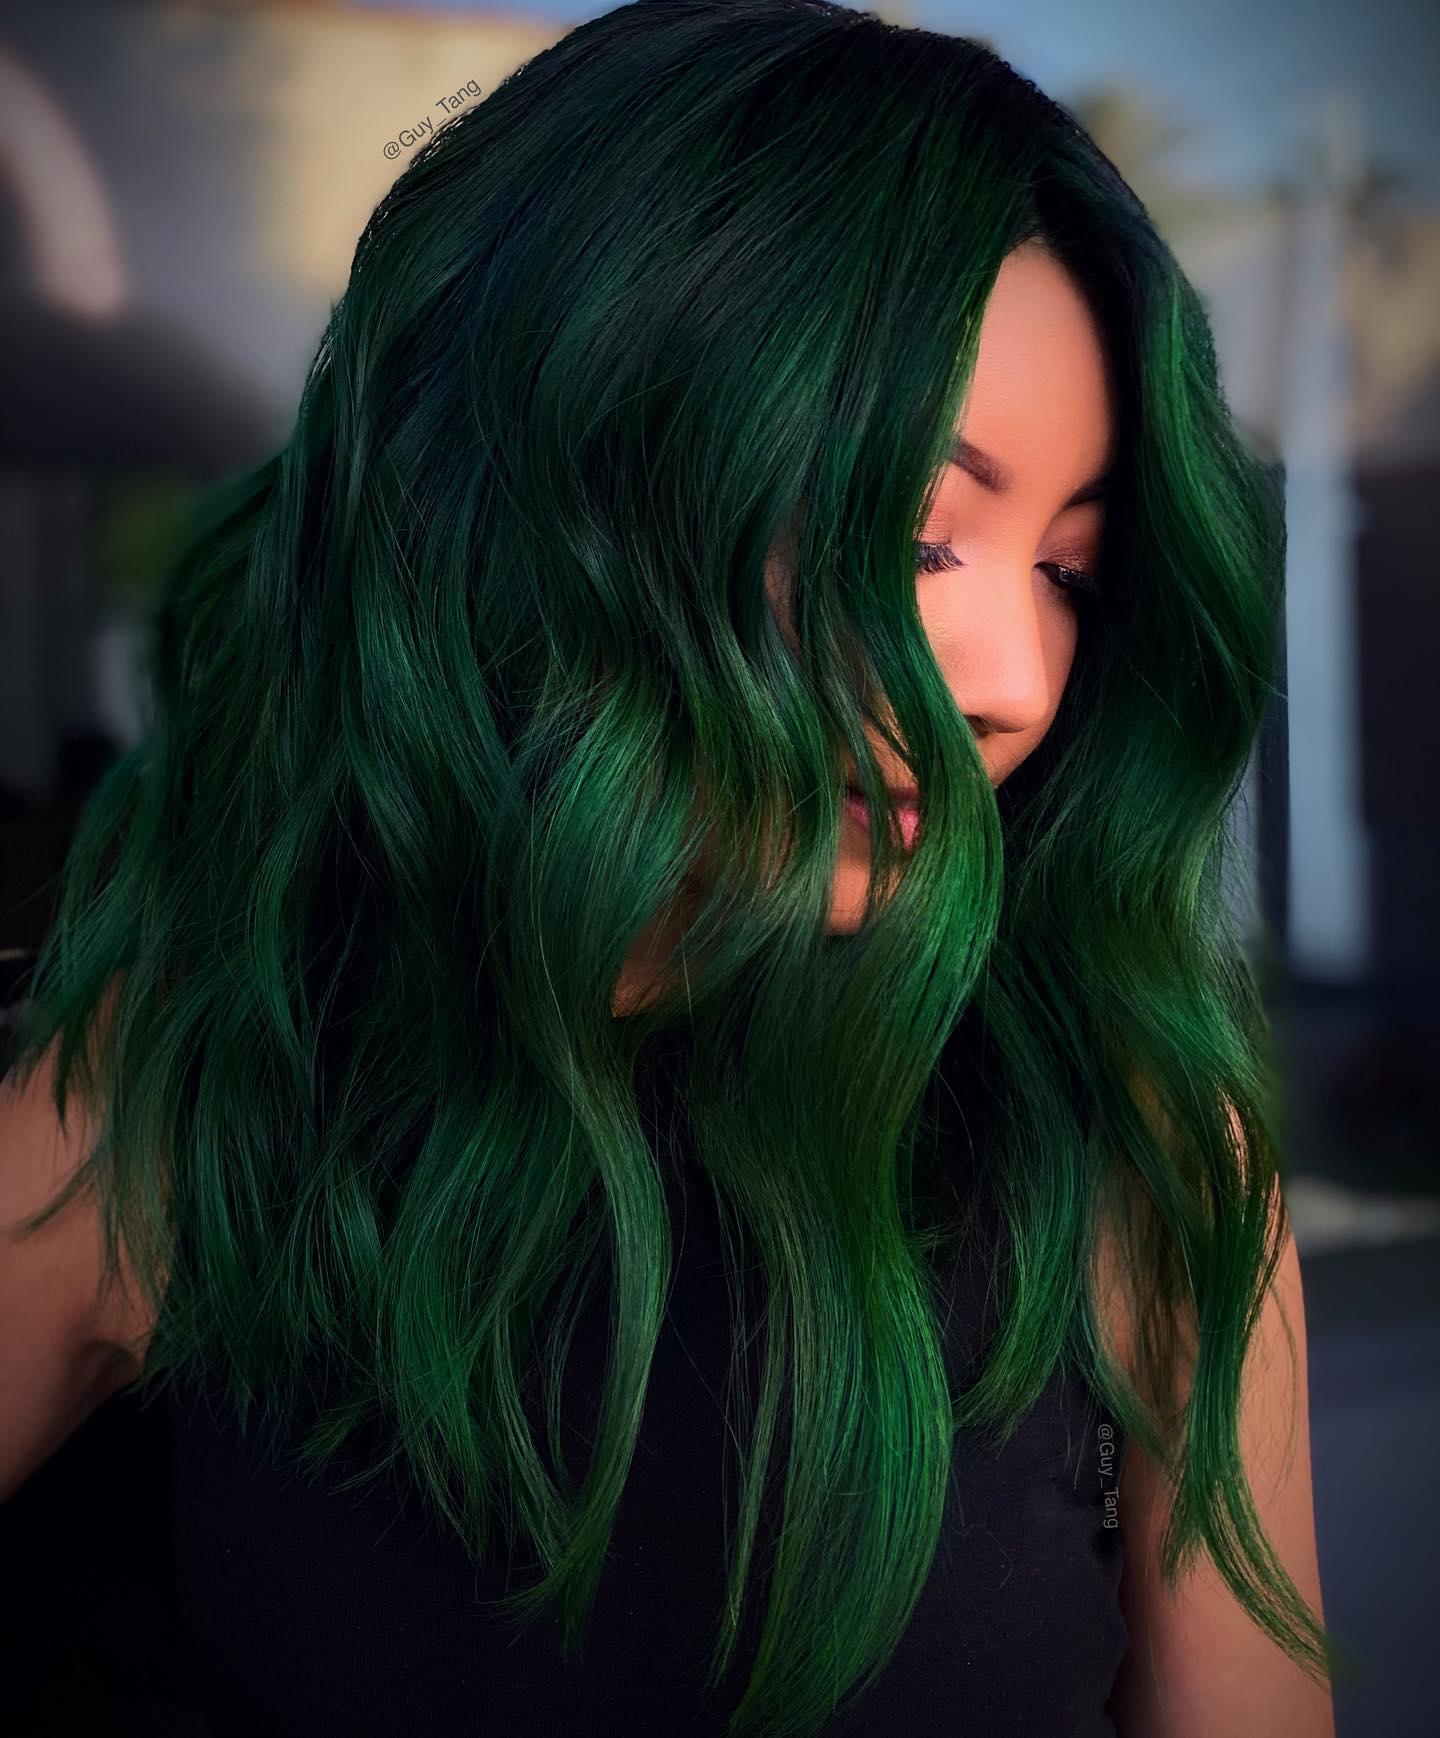 colore capelli verdi irlandese